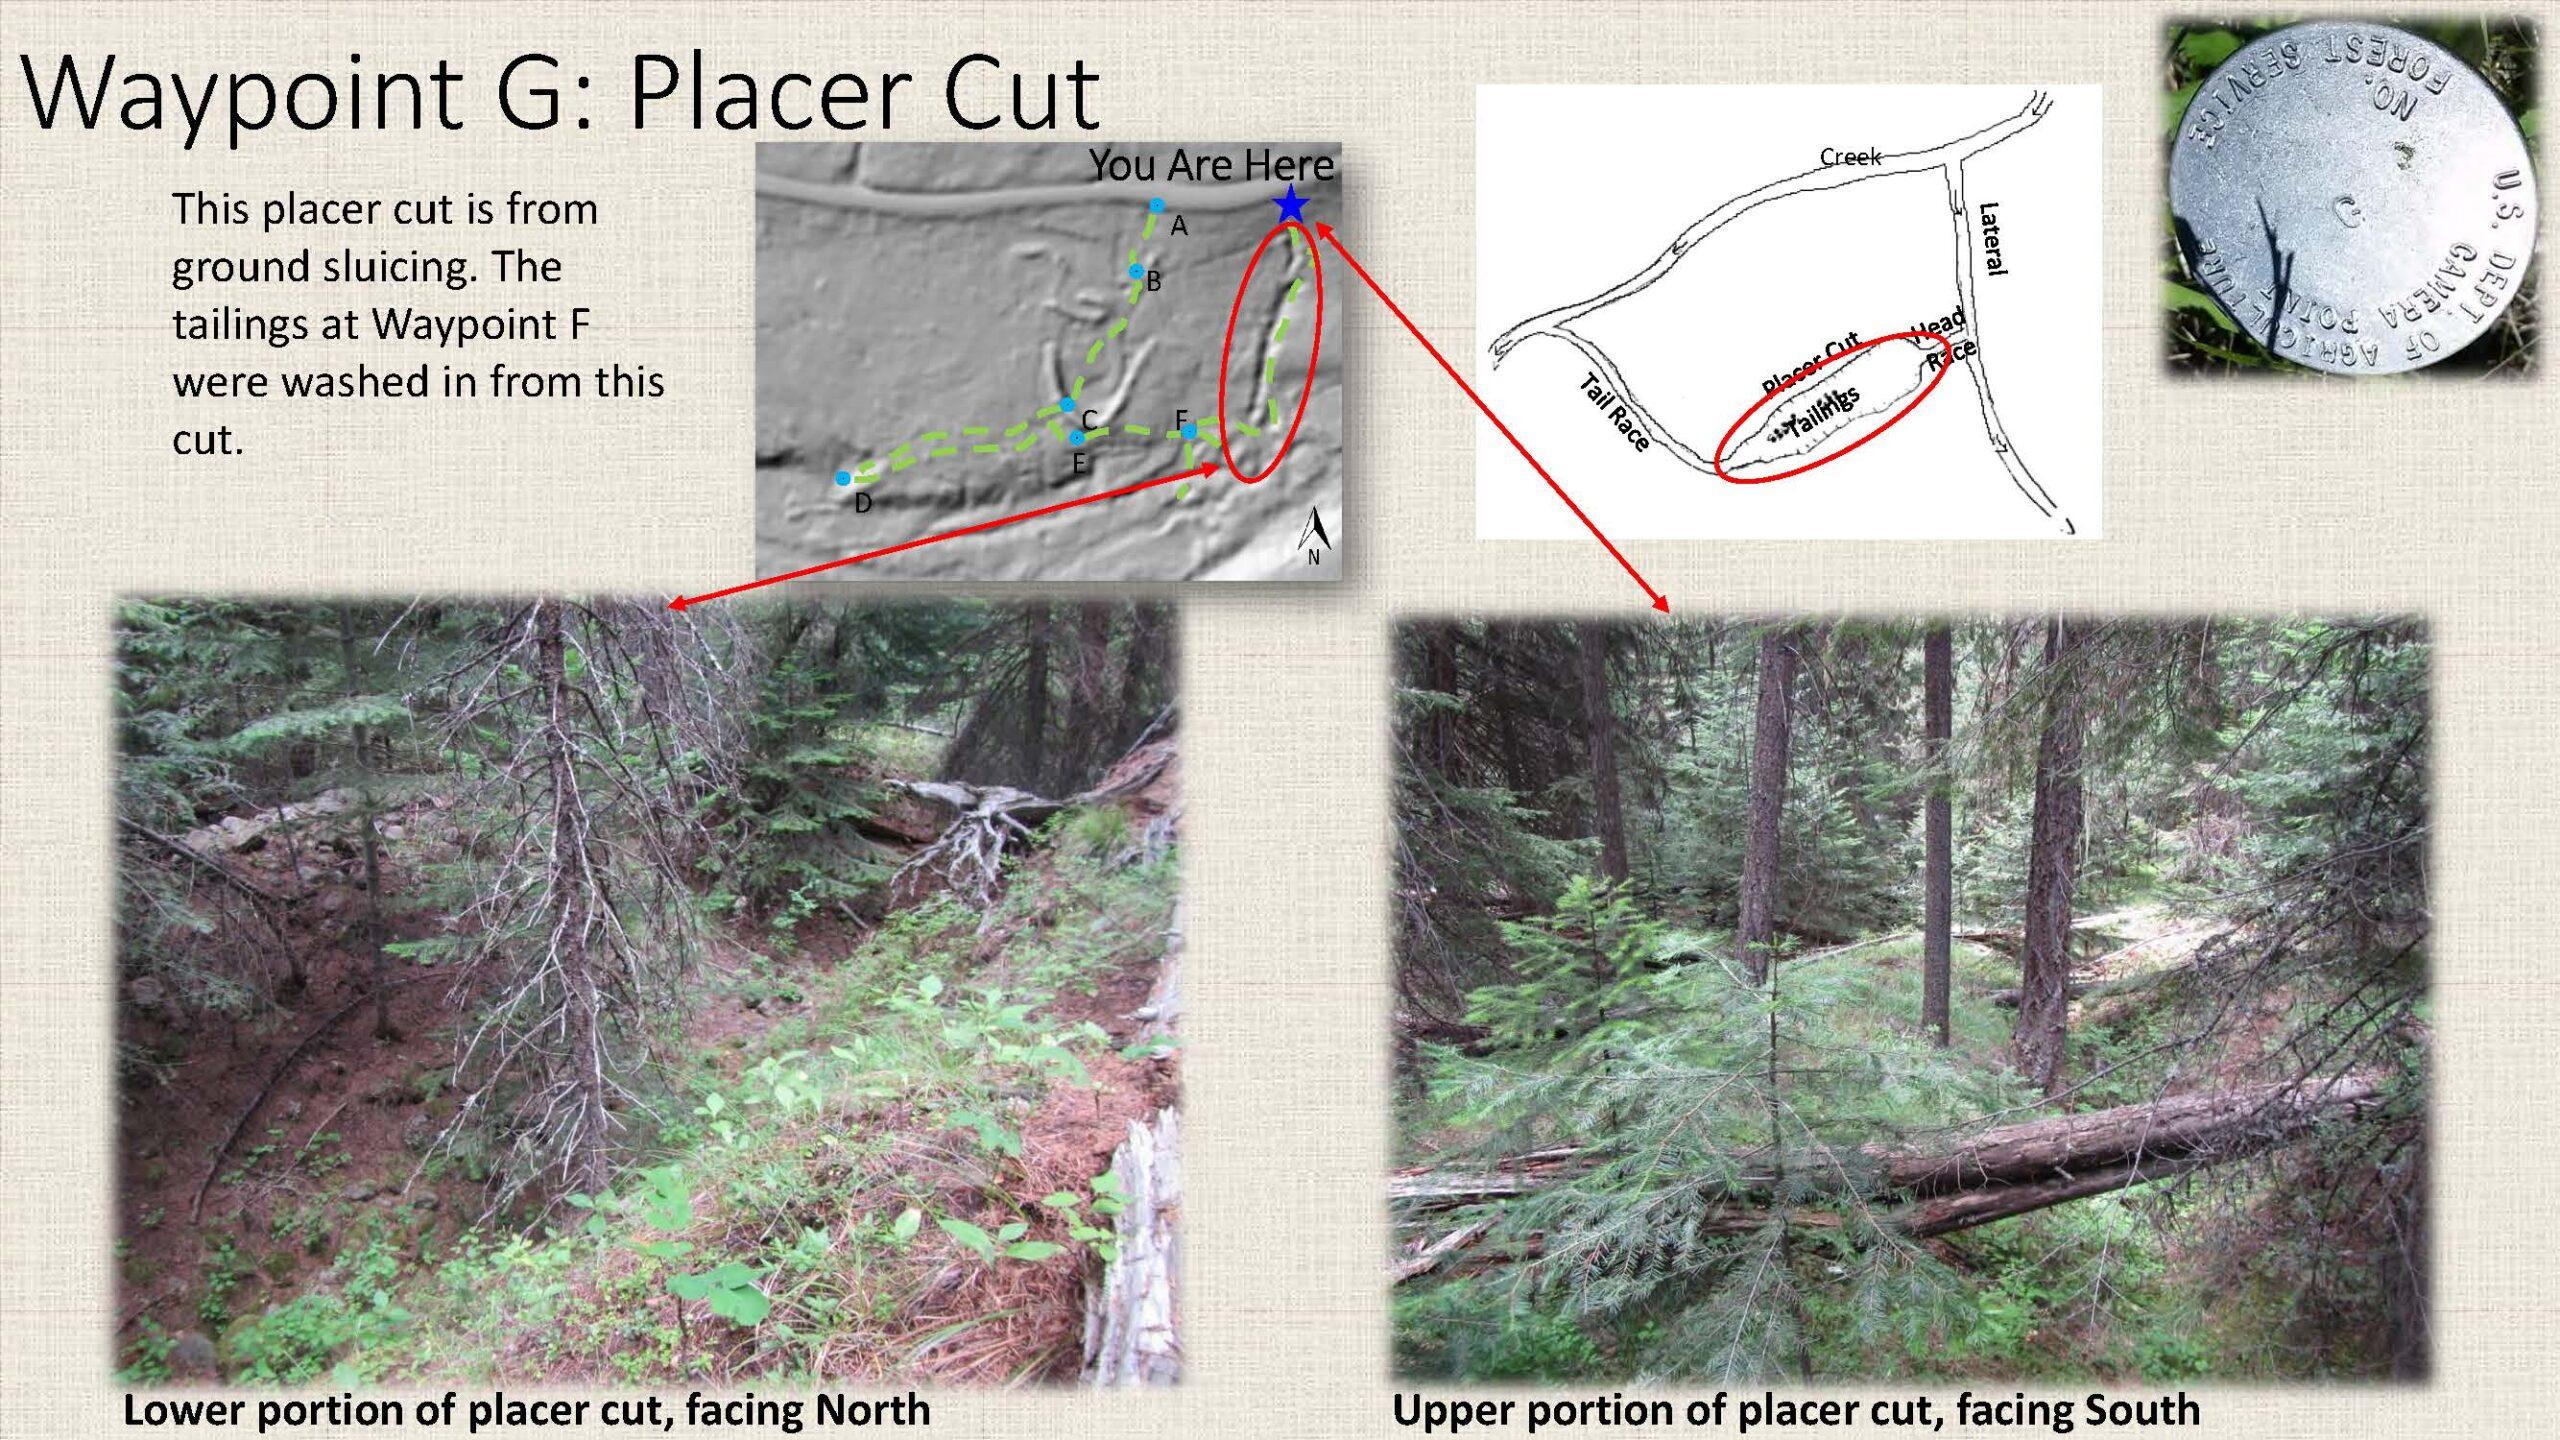 Waypoint G: Placer Cut